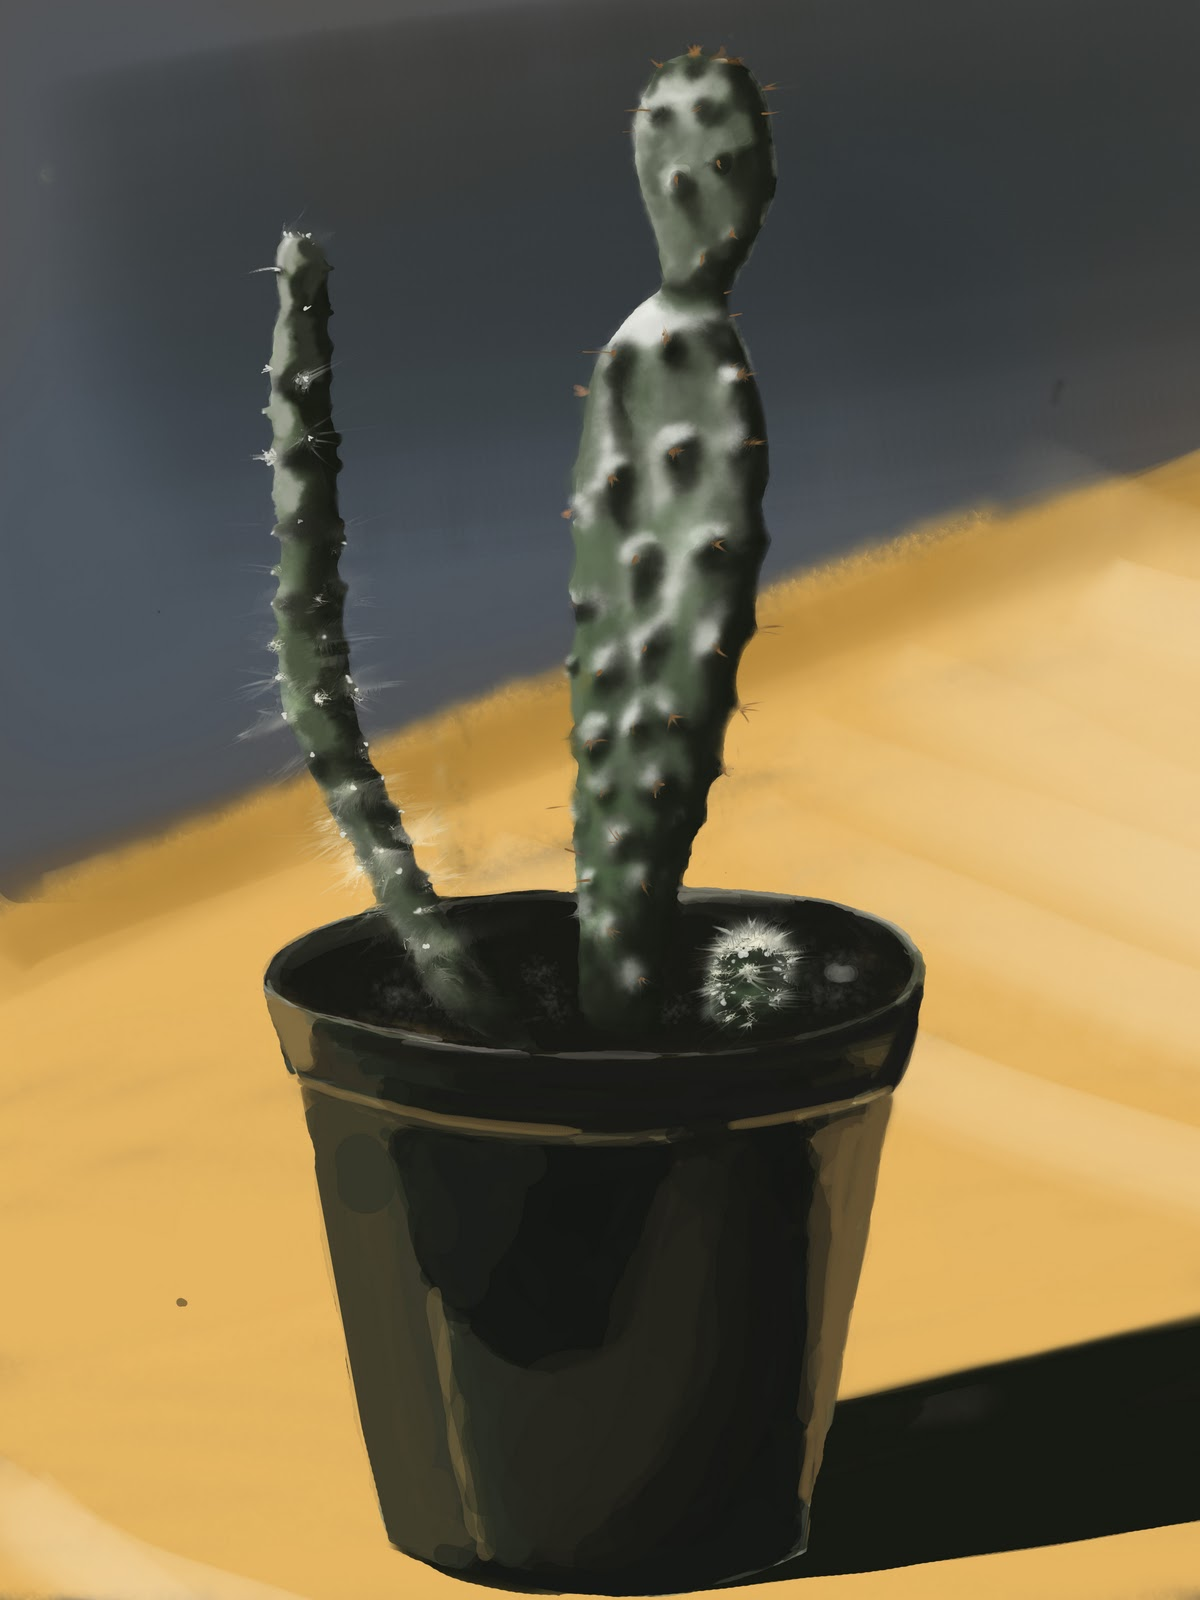 cactus plant photoshop